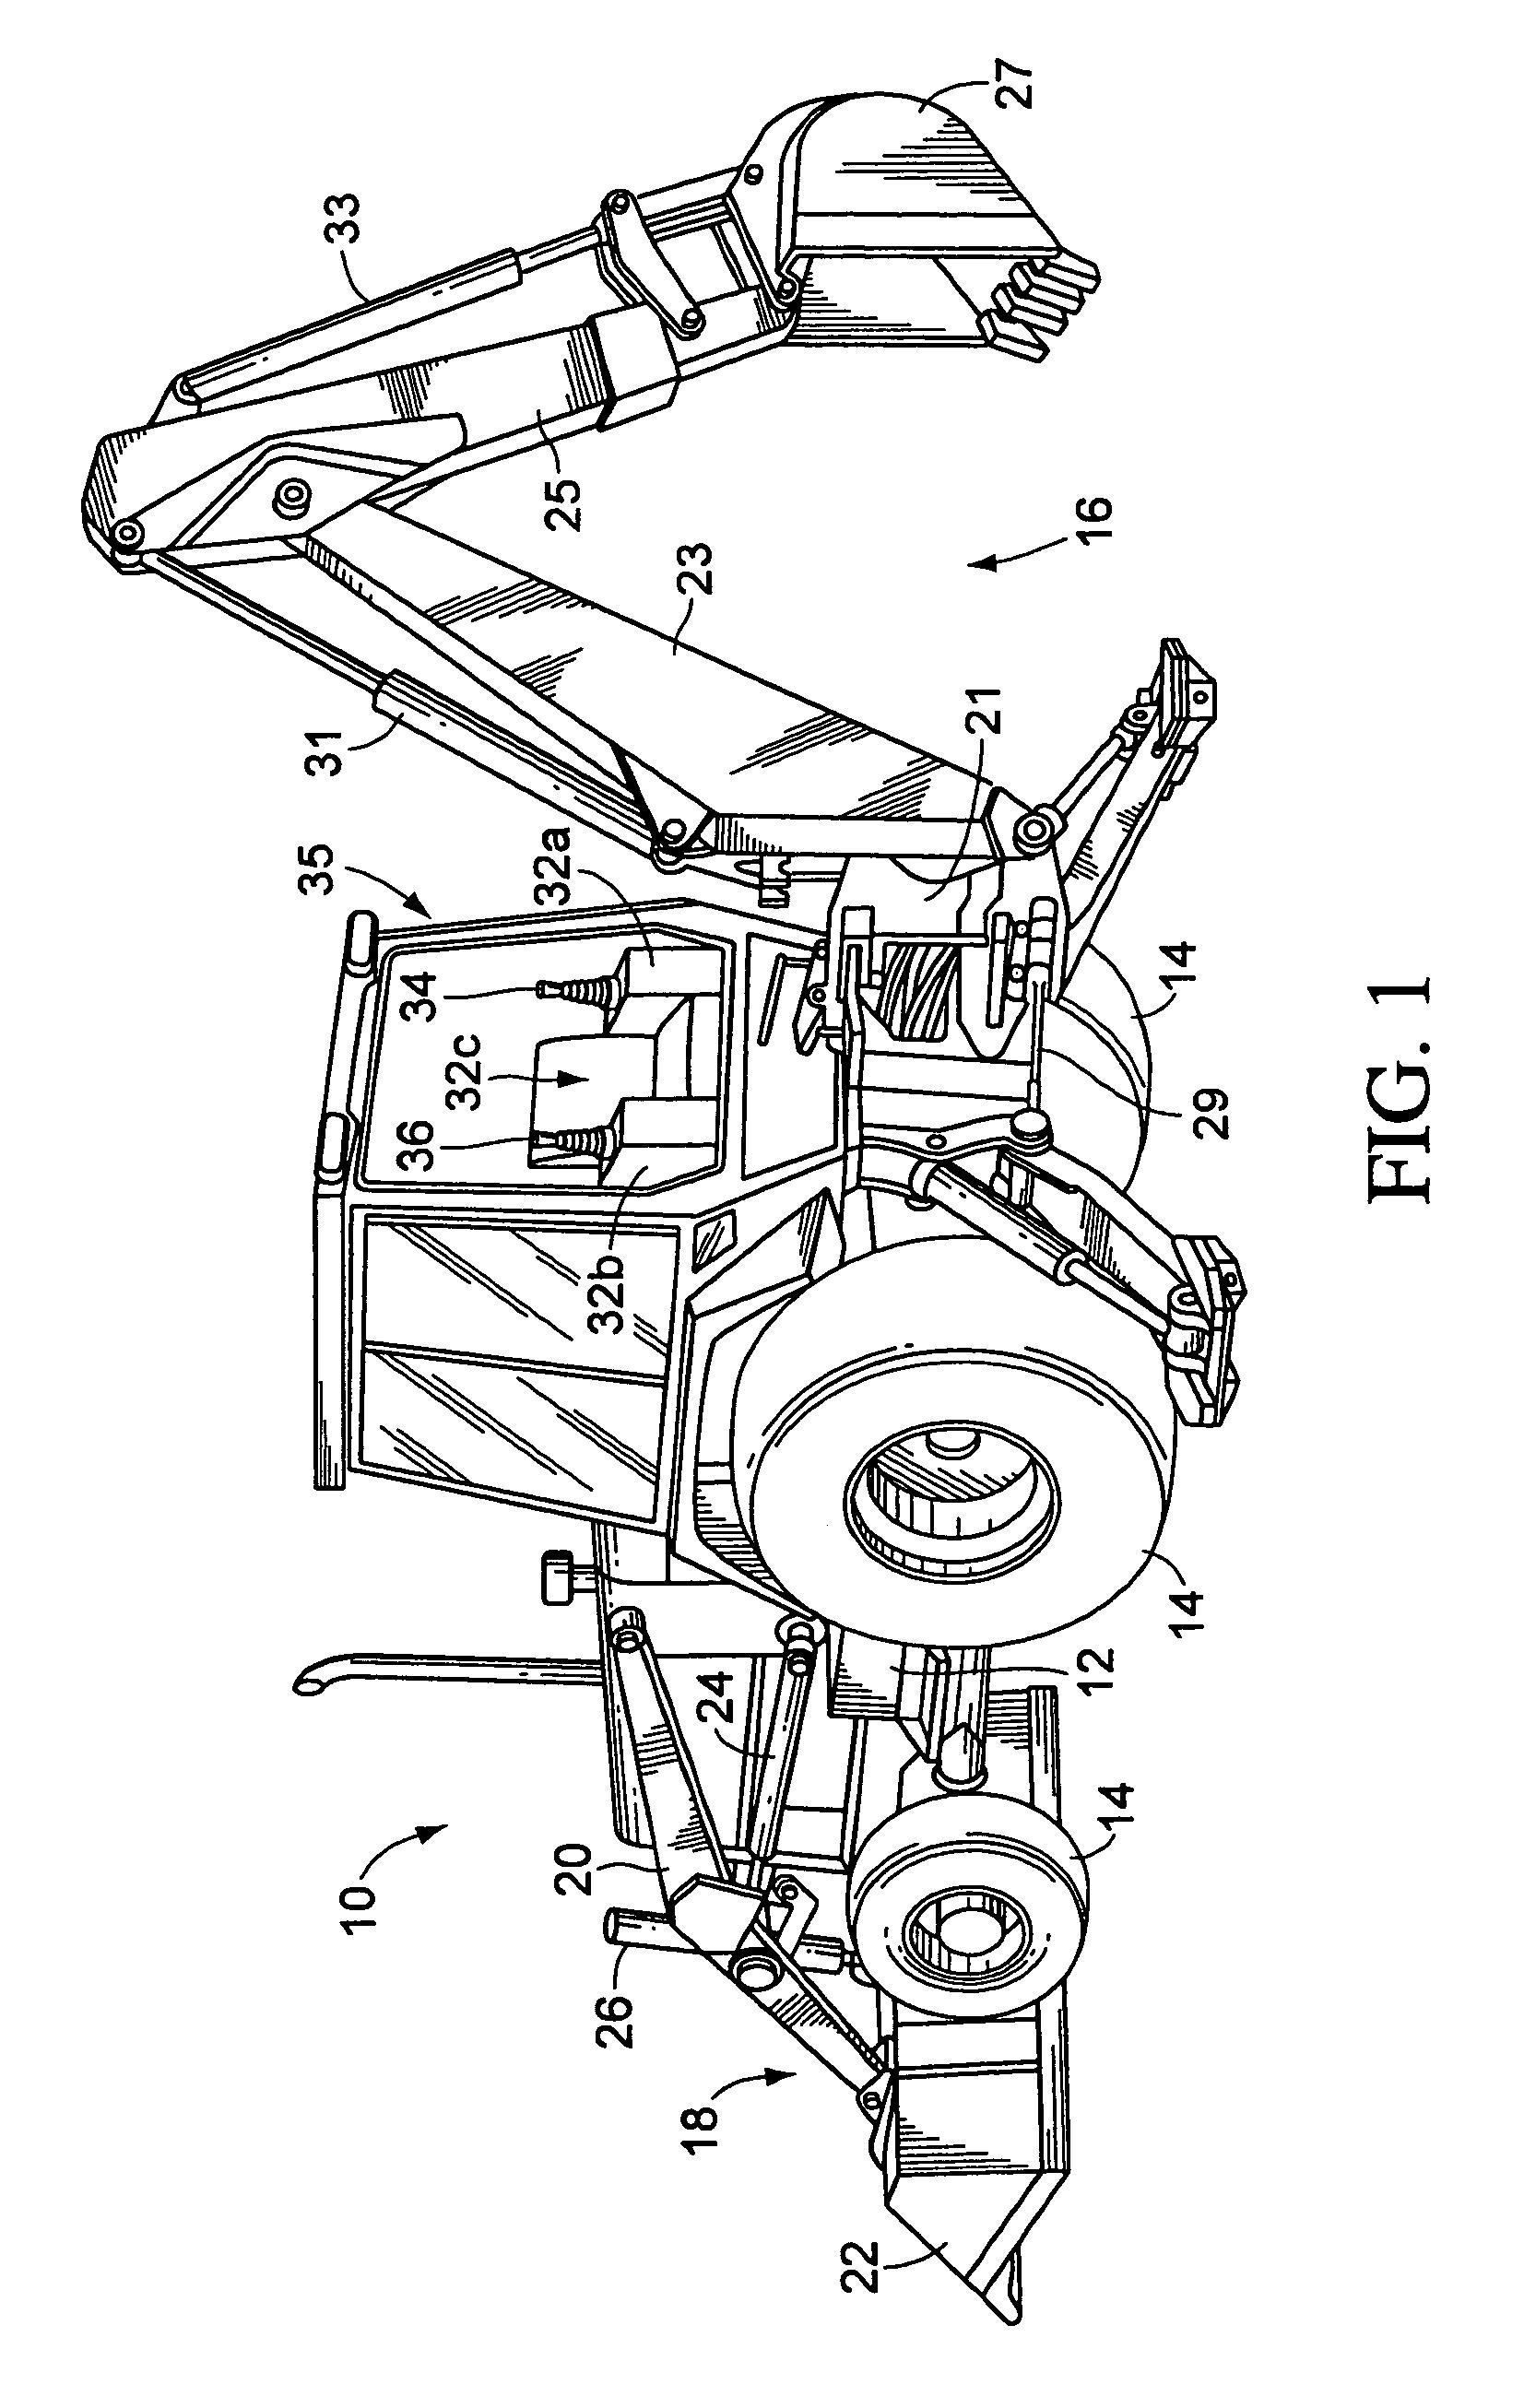 kubota bx22 parts diagram